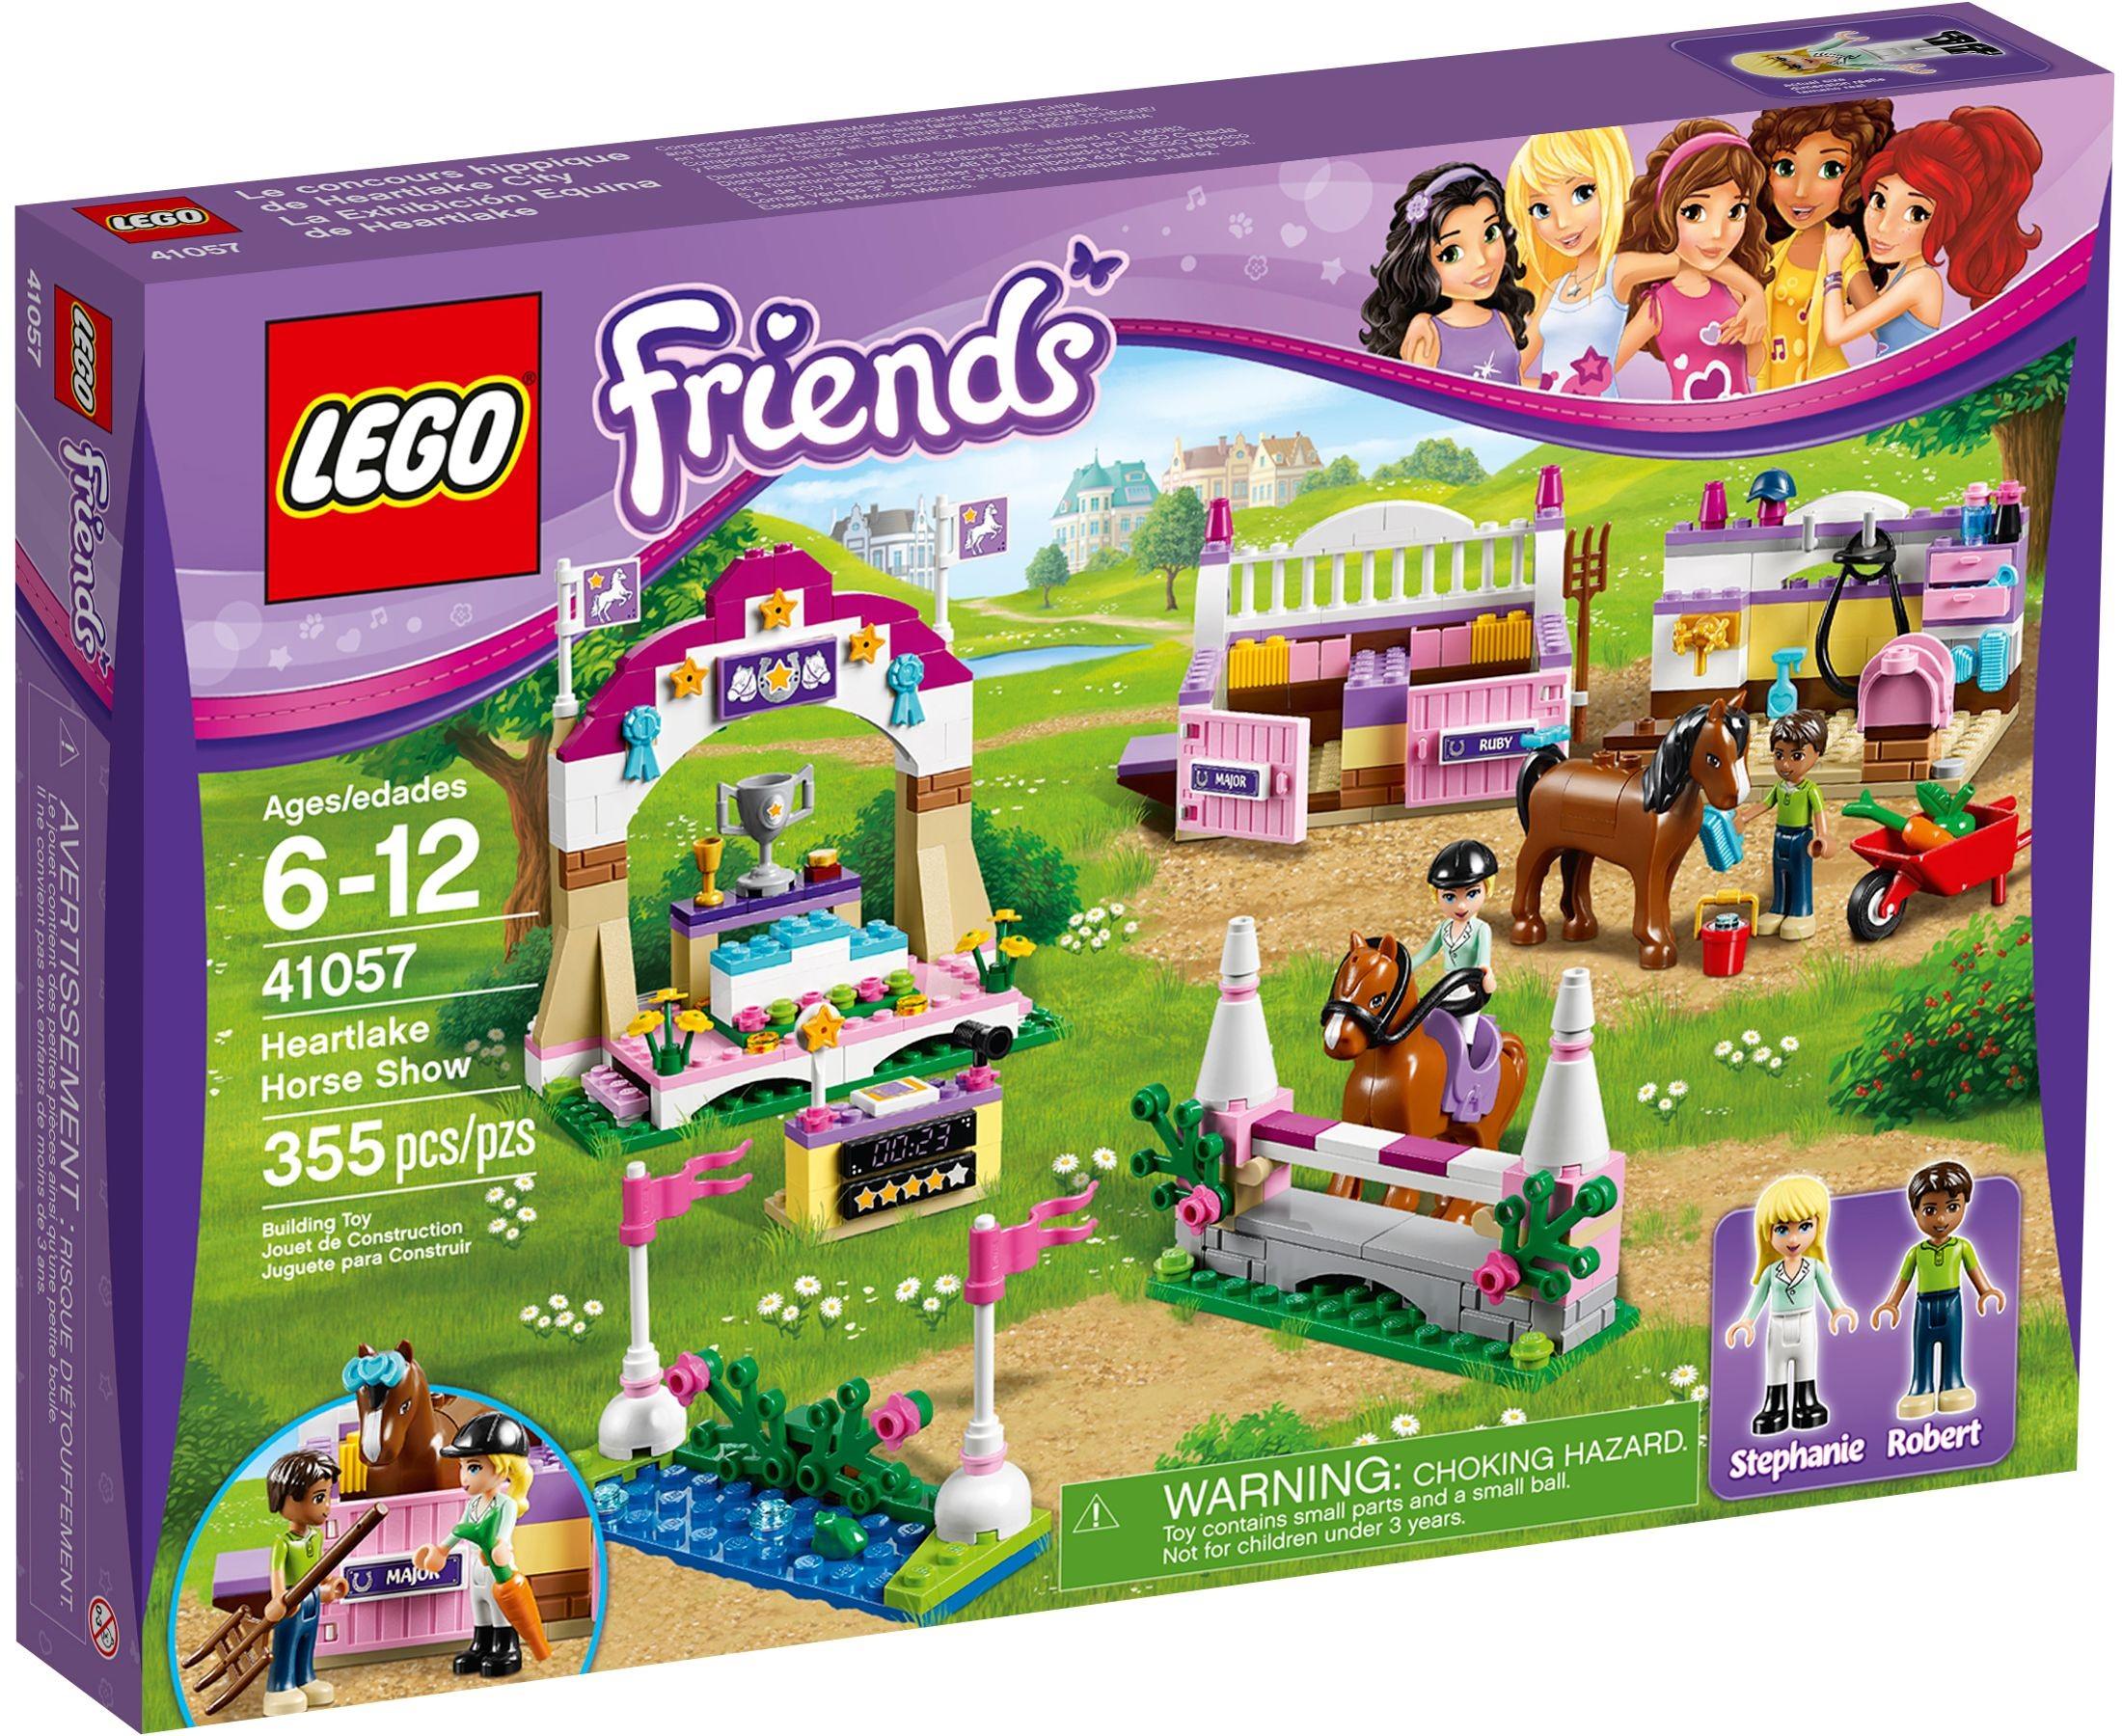 LEGO Friends Figur Minifig Junge Bub Boy Mann Pferde Horse Show 41057 Robert